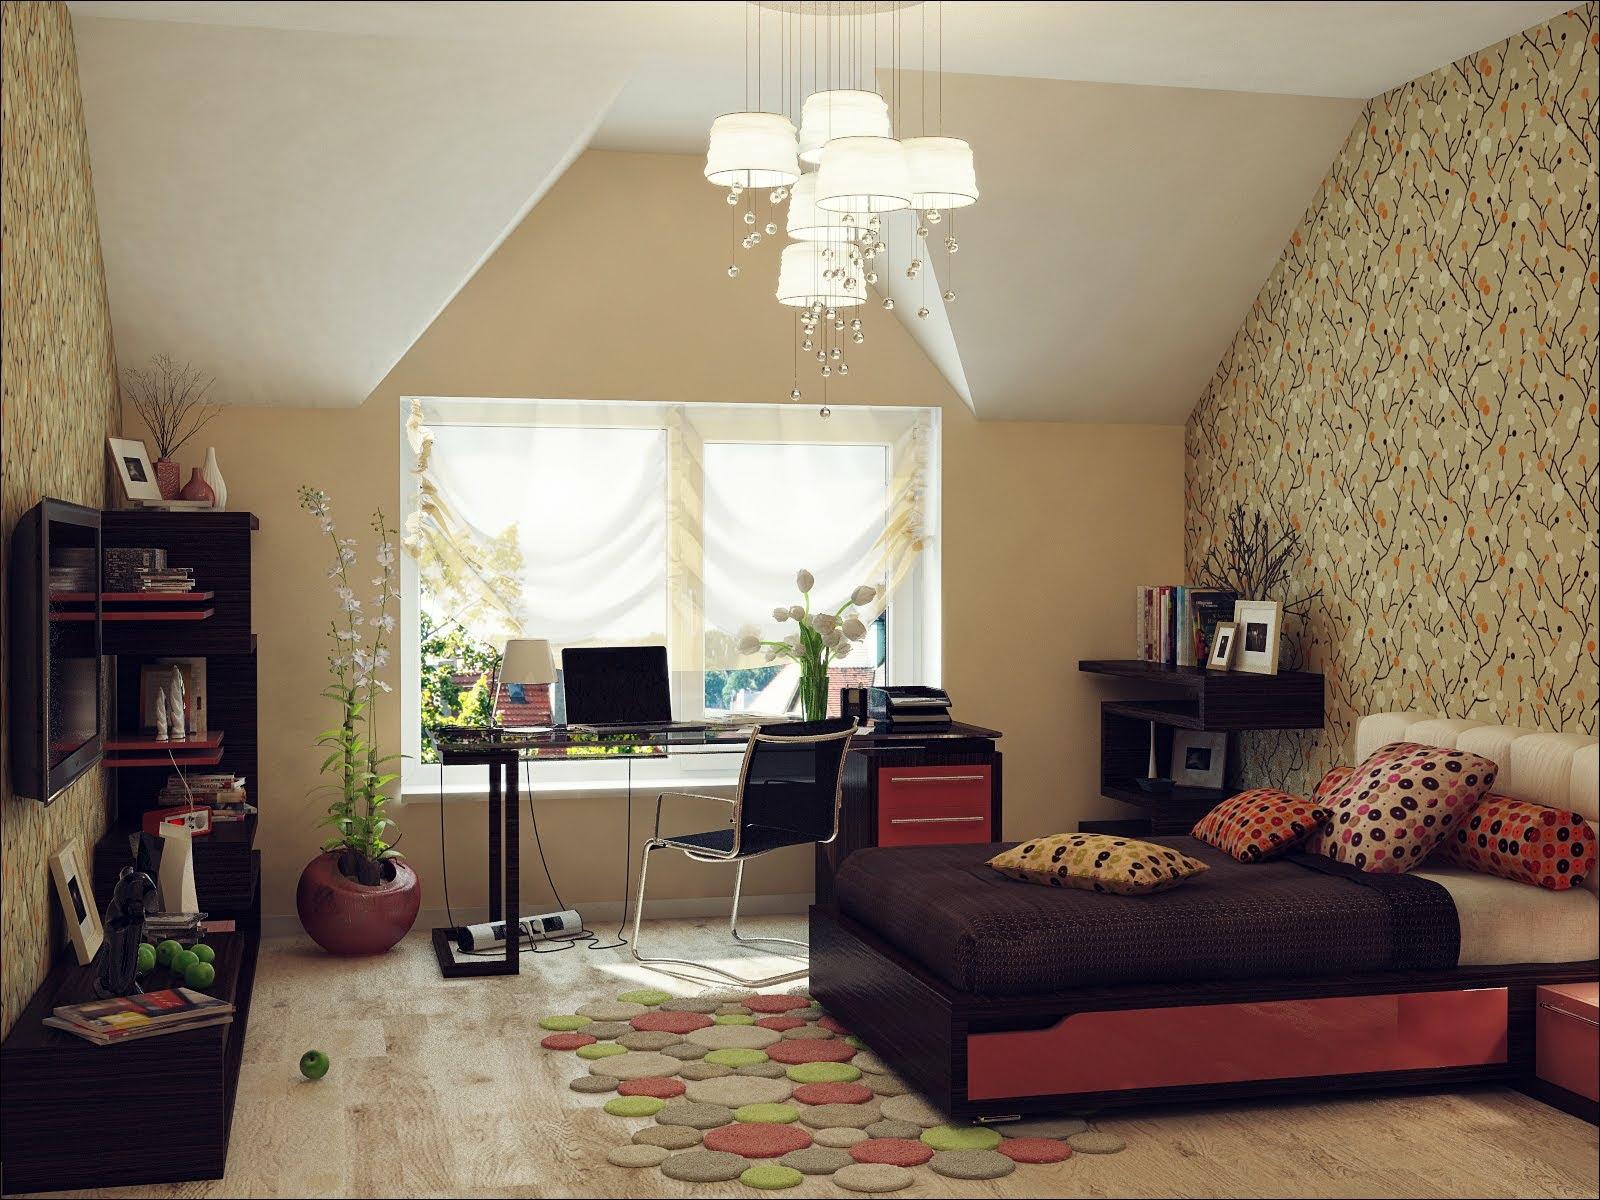 Home Architec Ideas Attic Bedroom Slanted Ceiling Bedroom Ideas